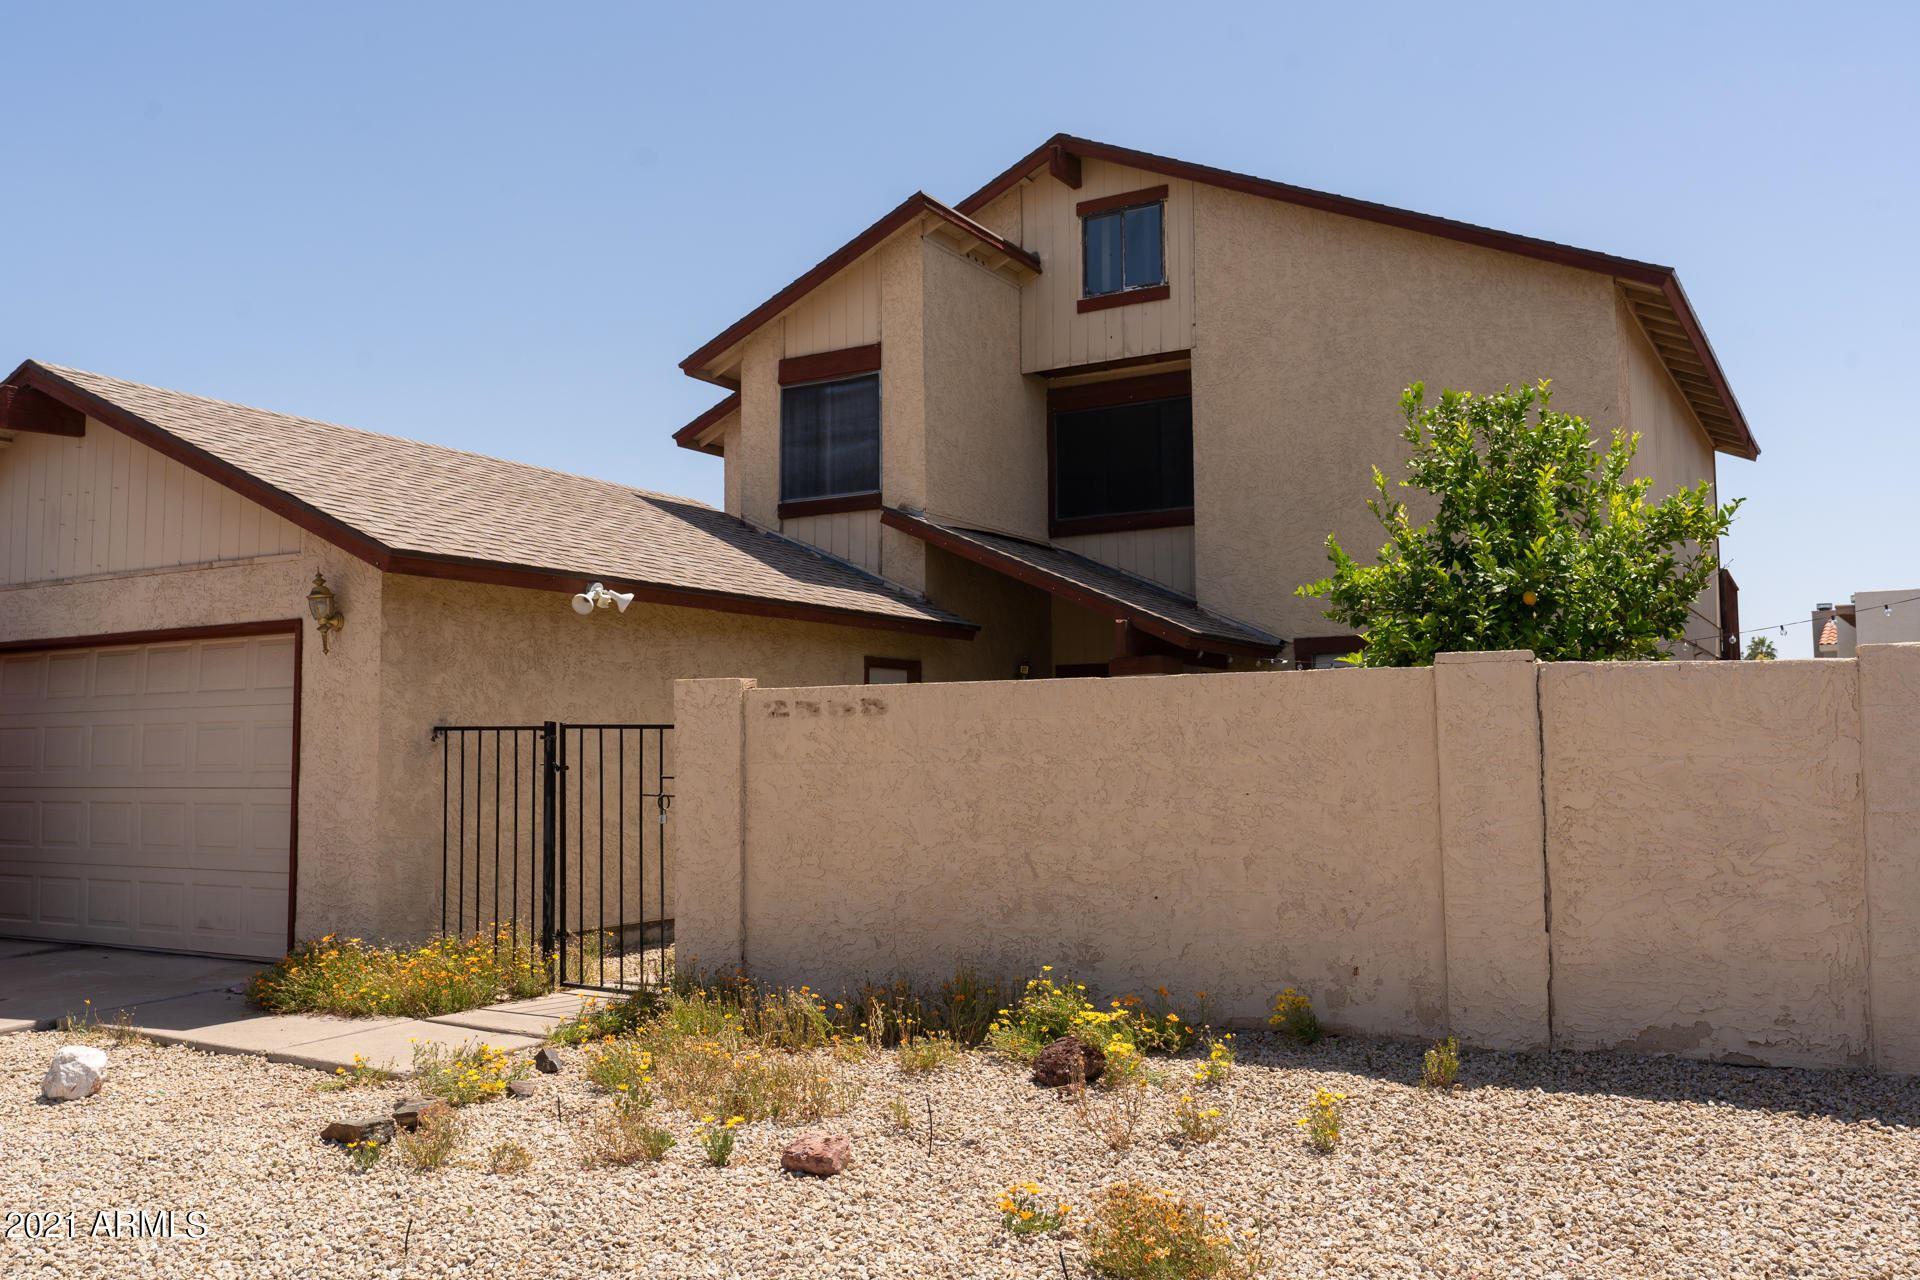 2555 W KIOWA Avenue, Mesa, AZ 85202 - MLS#: 6231712